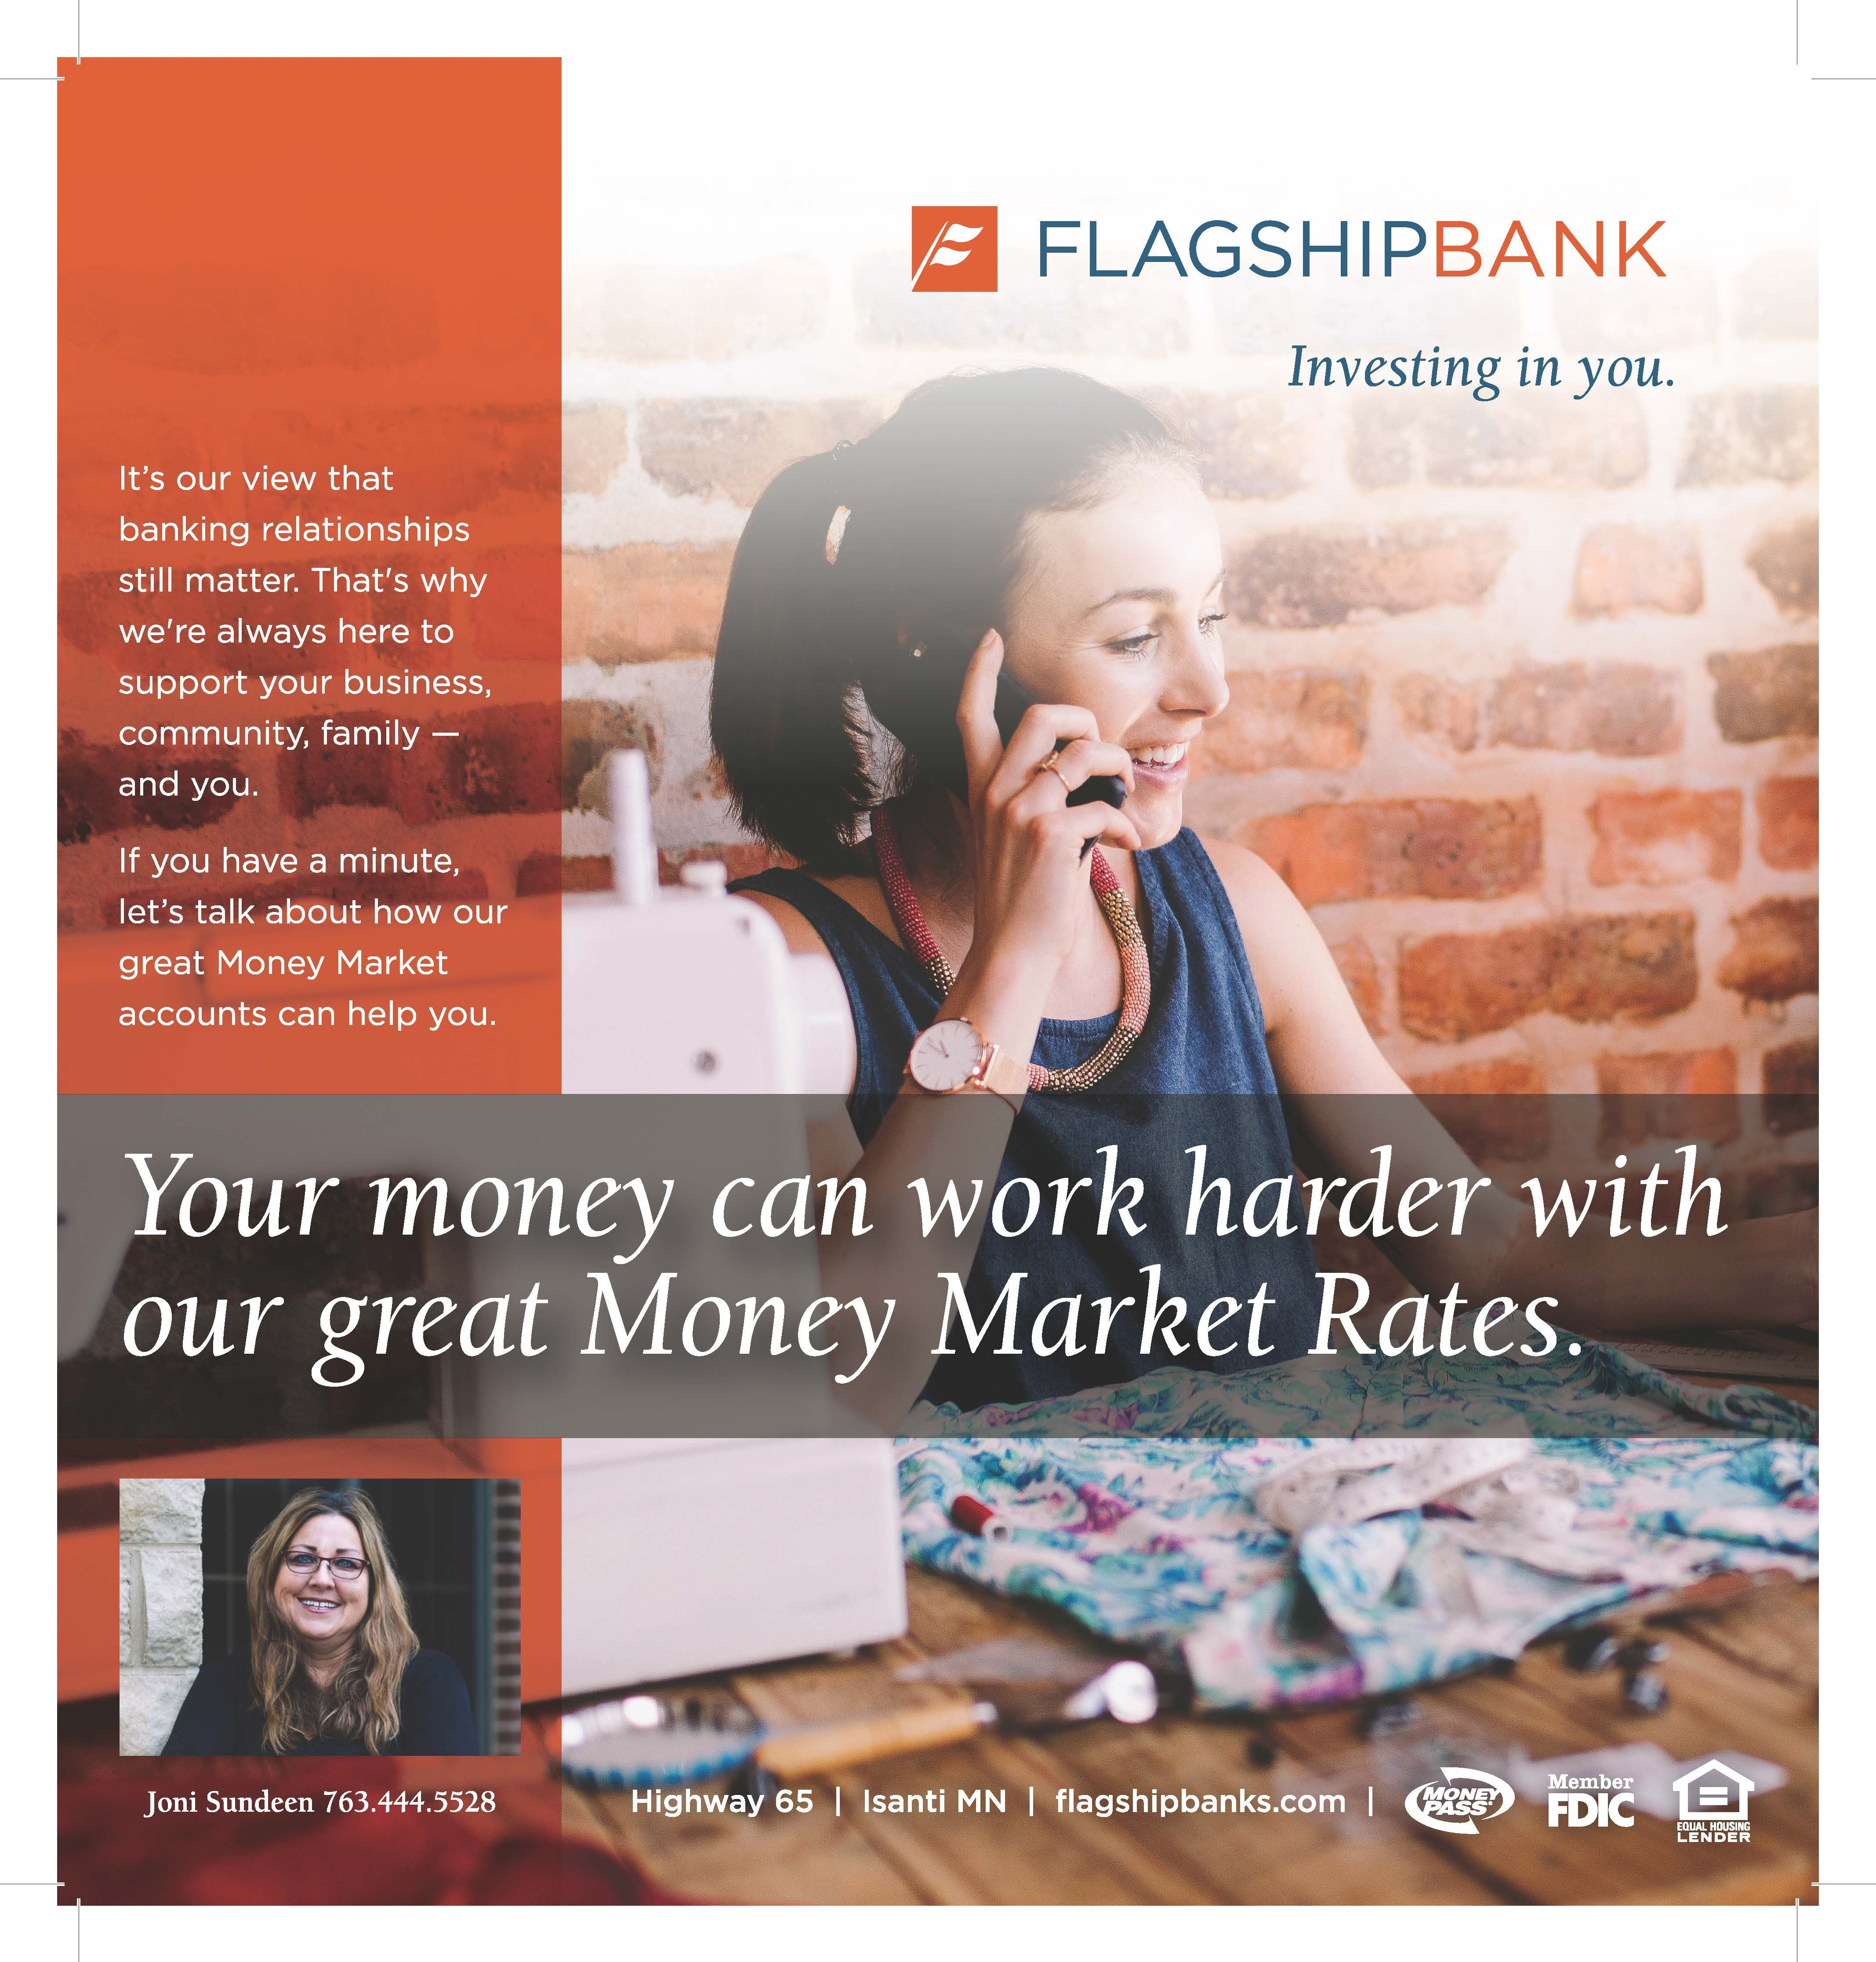 Flagship Bank 2018 Advertisement For Local Newspaper Seamstress Bankads Advertising Communitybank Smallbiz Ads Banks Bank Flag Banks Ads Banking Ads